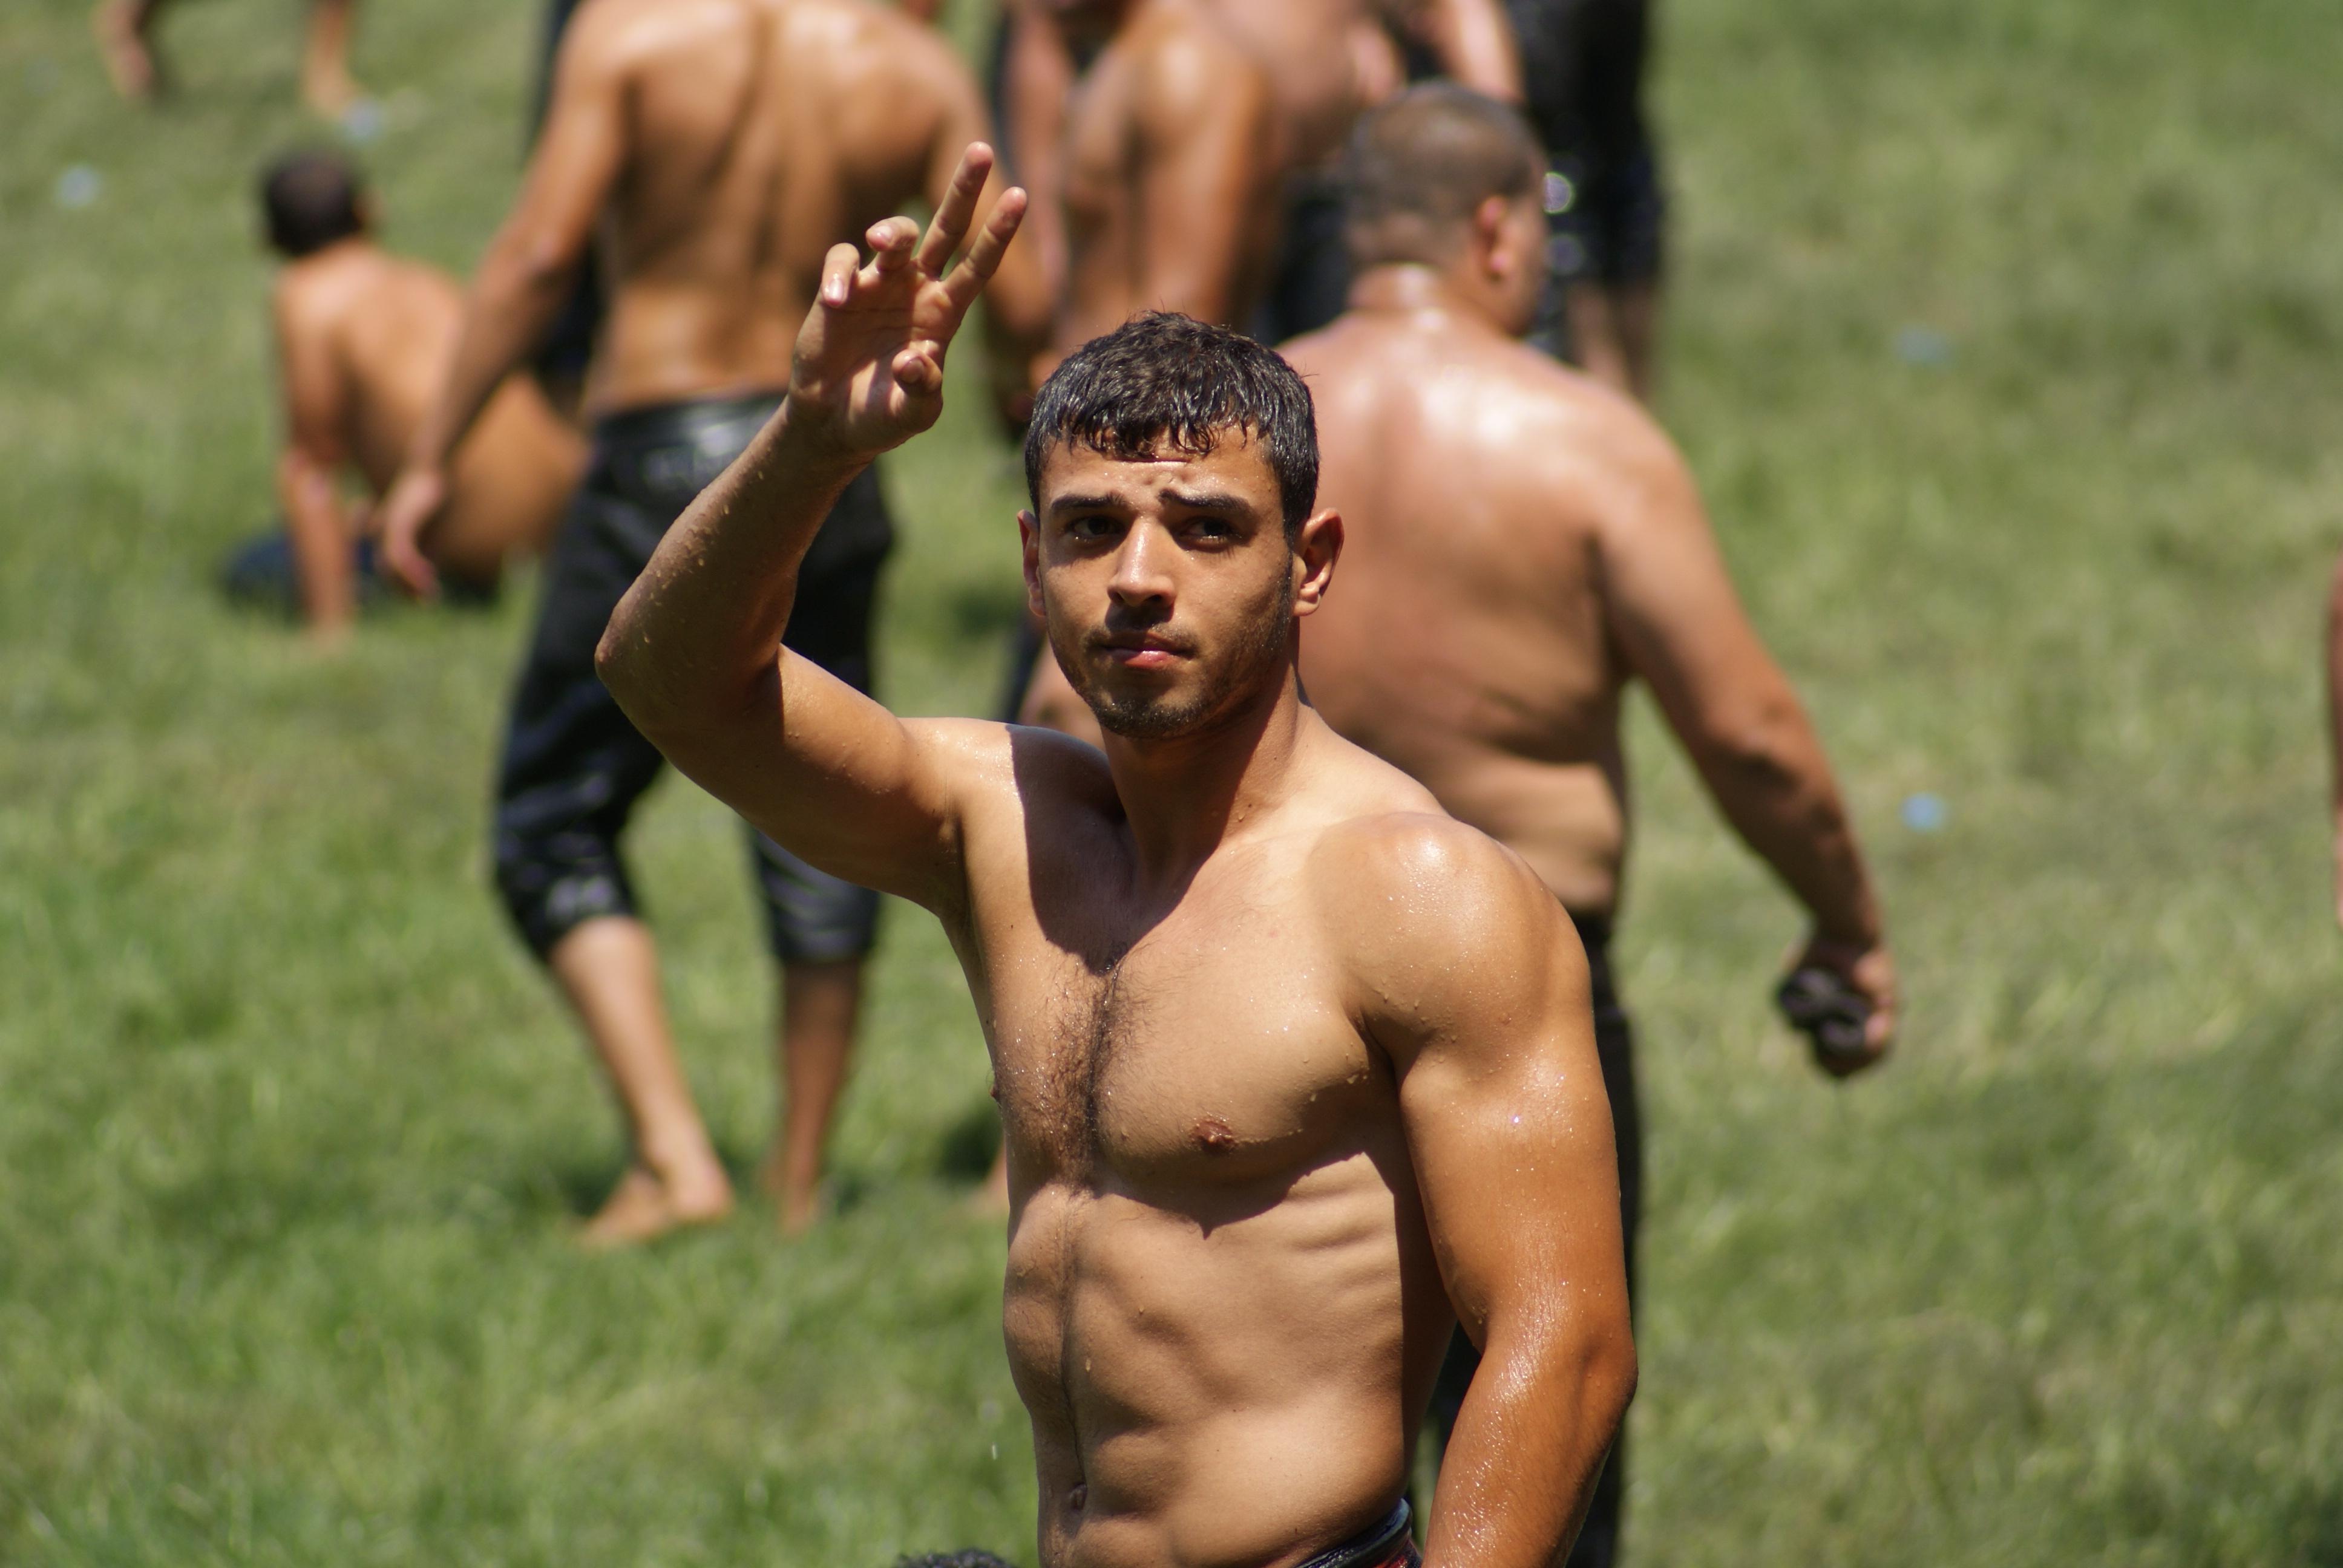 Turkish oil wrestling photos Feature - Turkish Oil Wrestlers - Magnum Photos